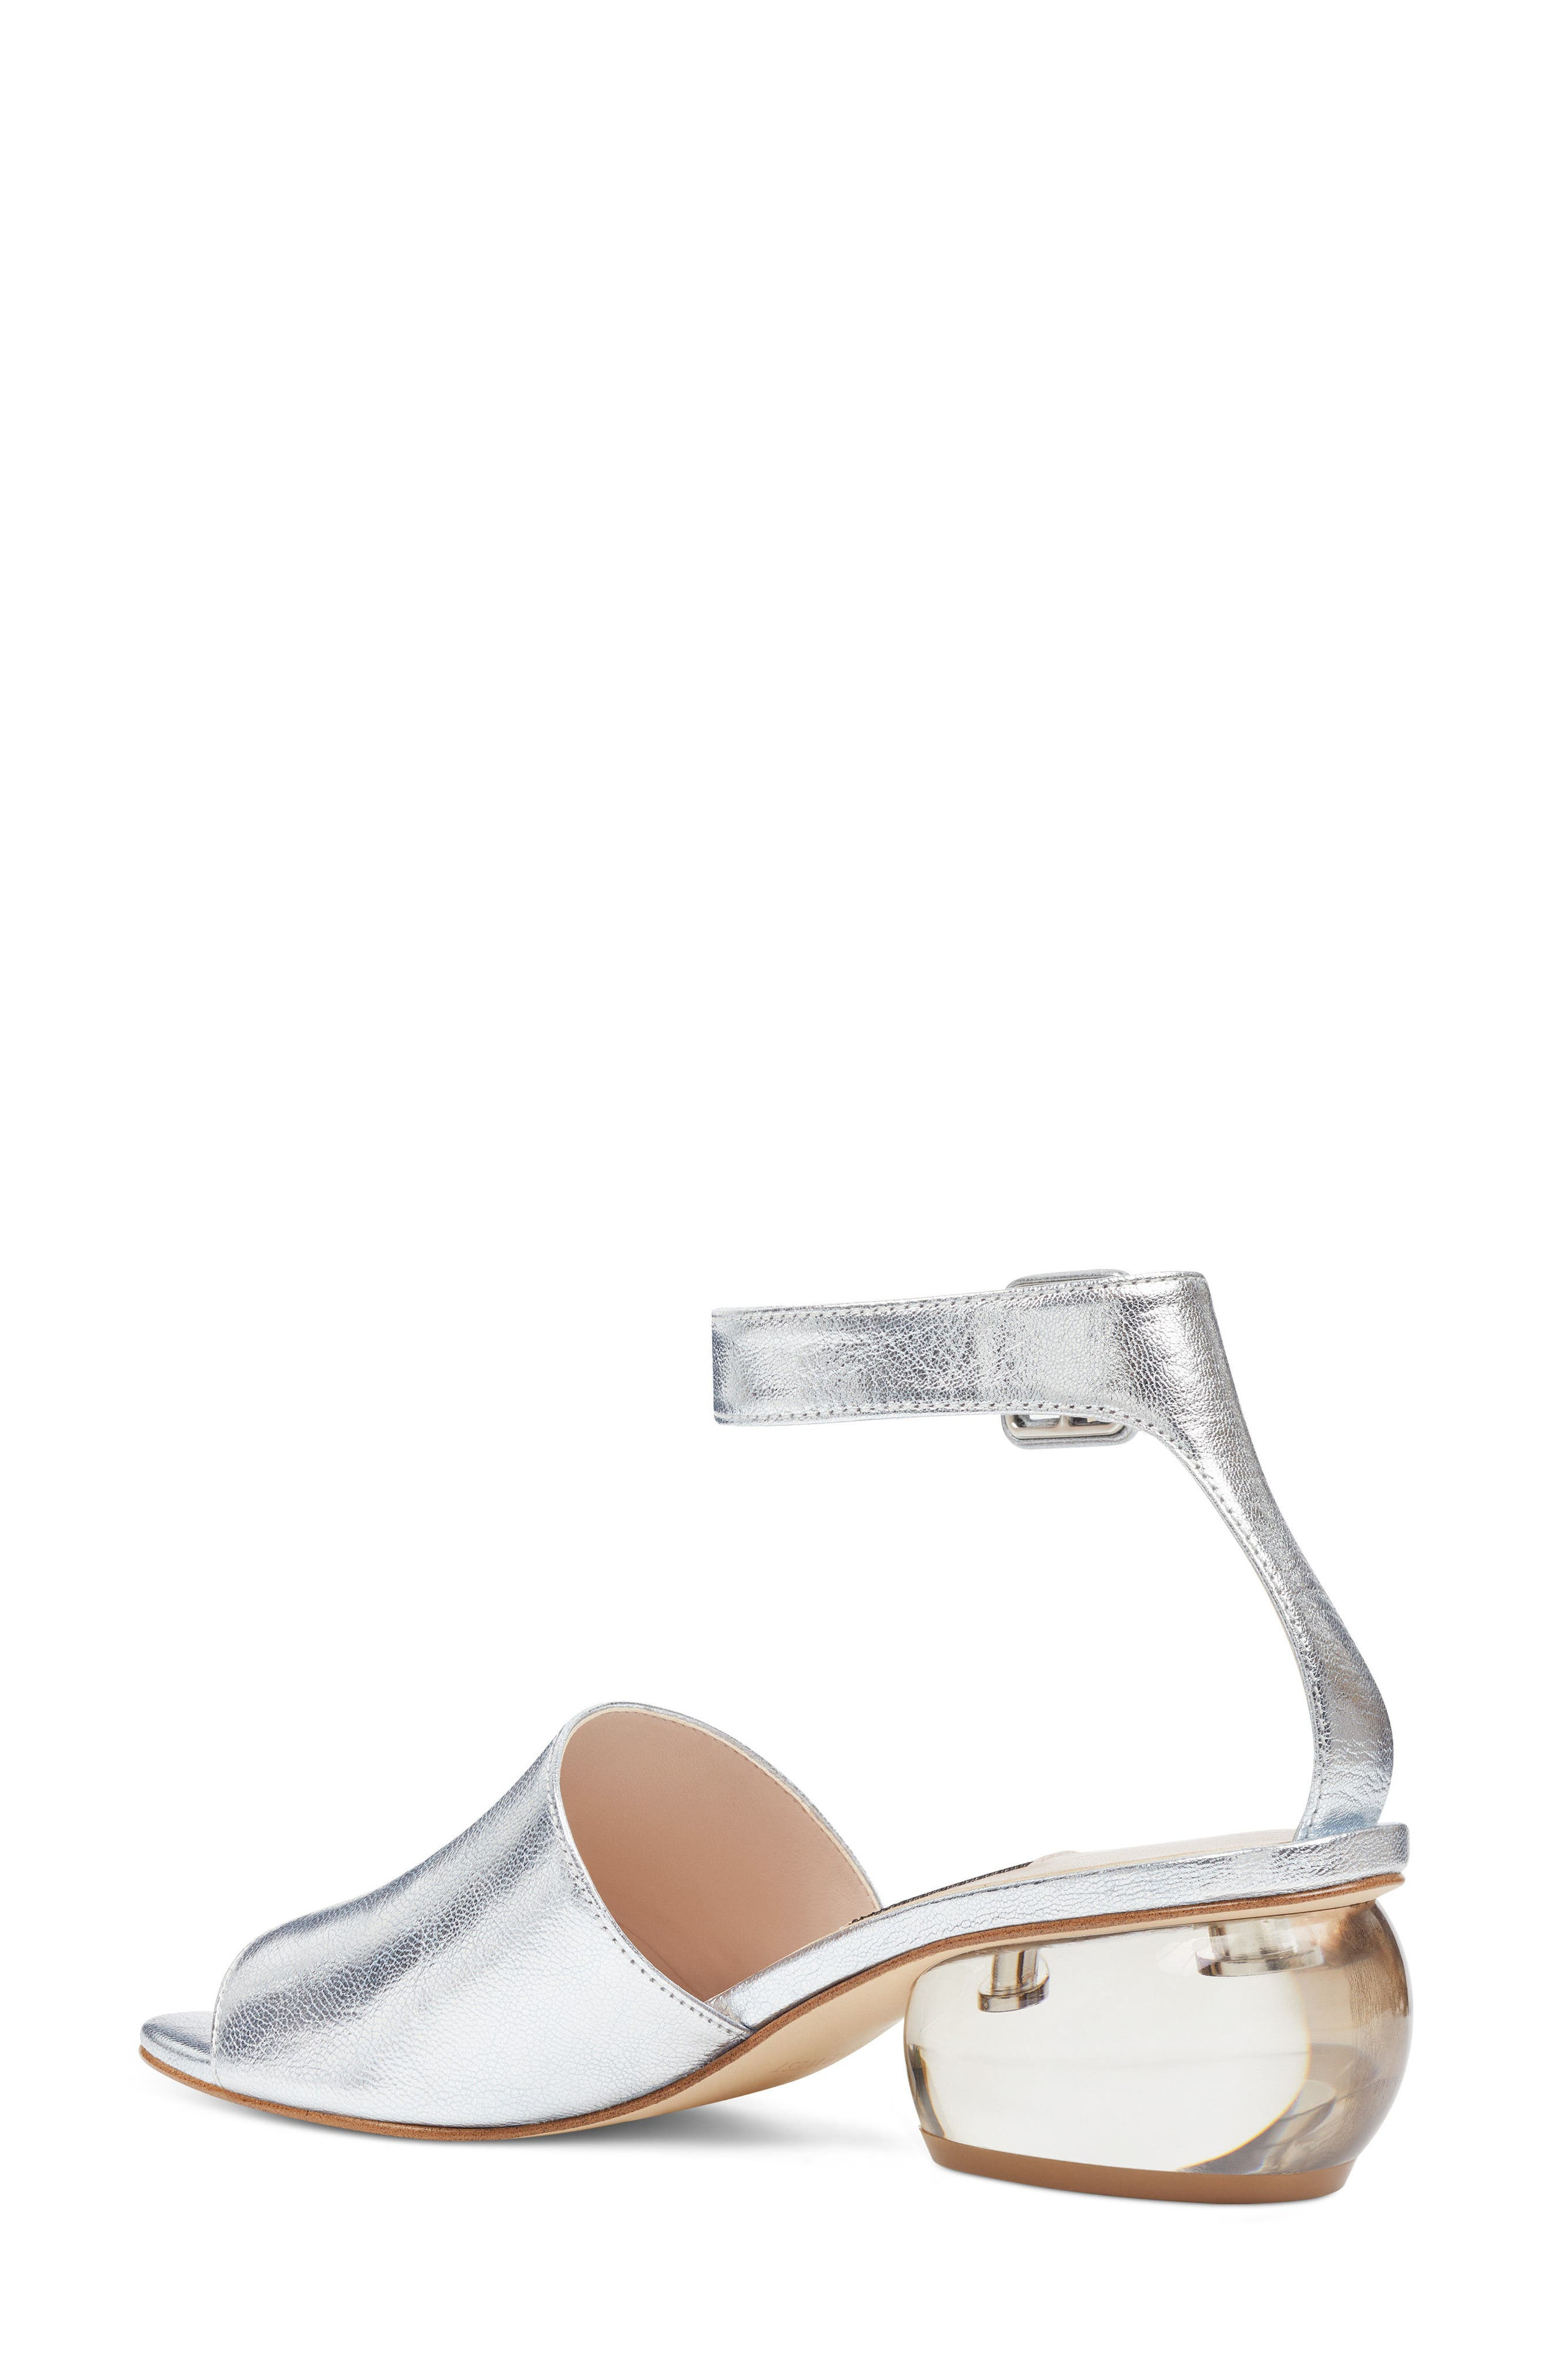 Enyo Clear Heel Sandal,                             Alternate thumbnail 4, color,